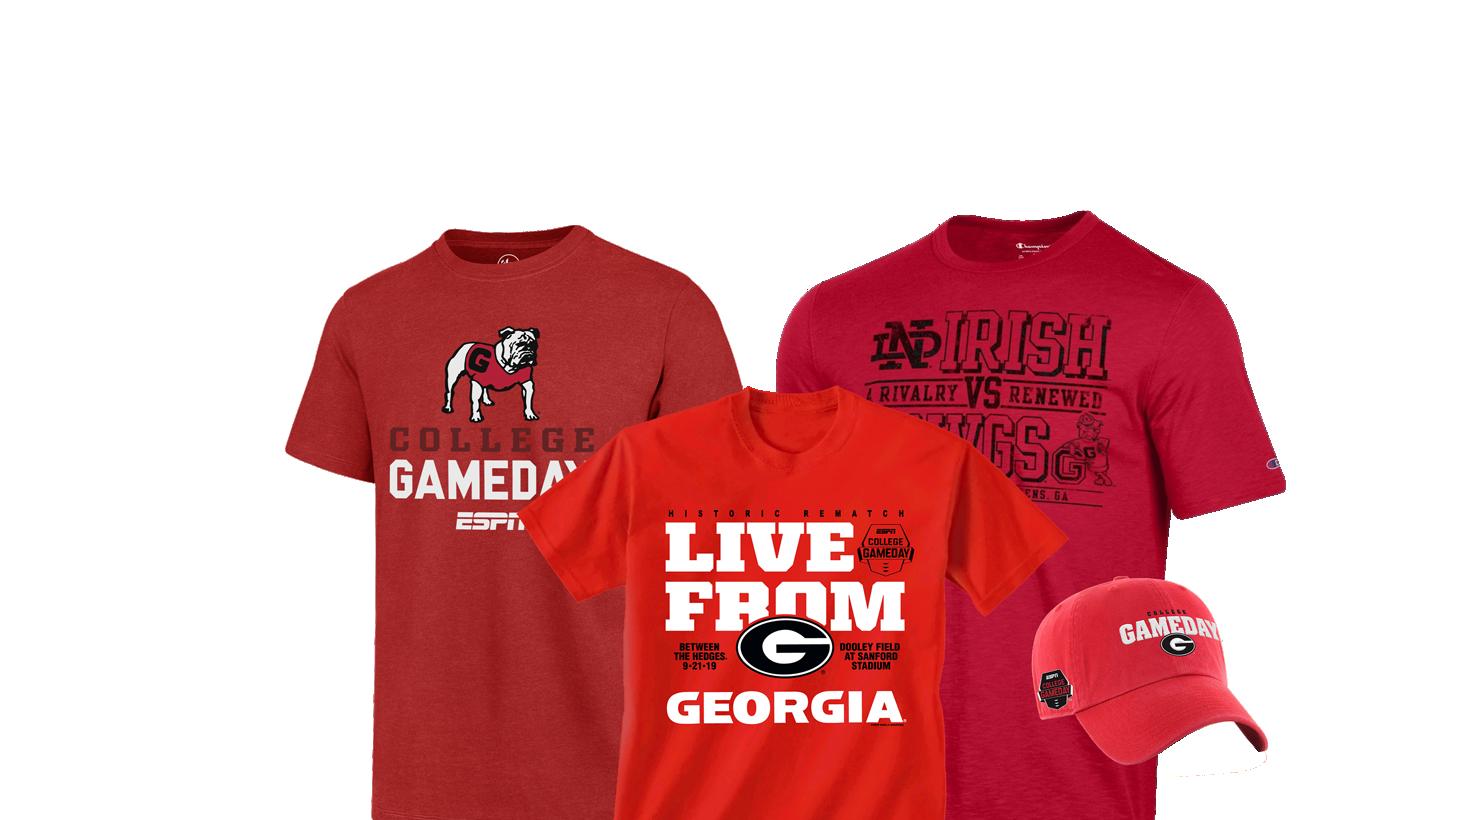 new arrivals 89df4 71384 Georgia Bulldogs Apparel | UGA Gear, Merchandise & Gifts